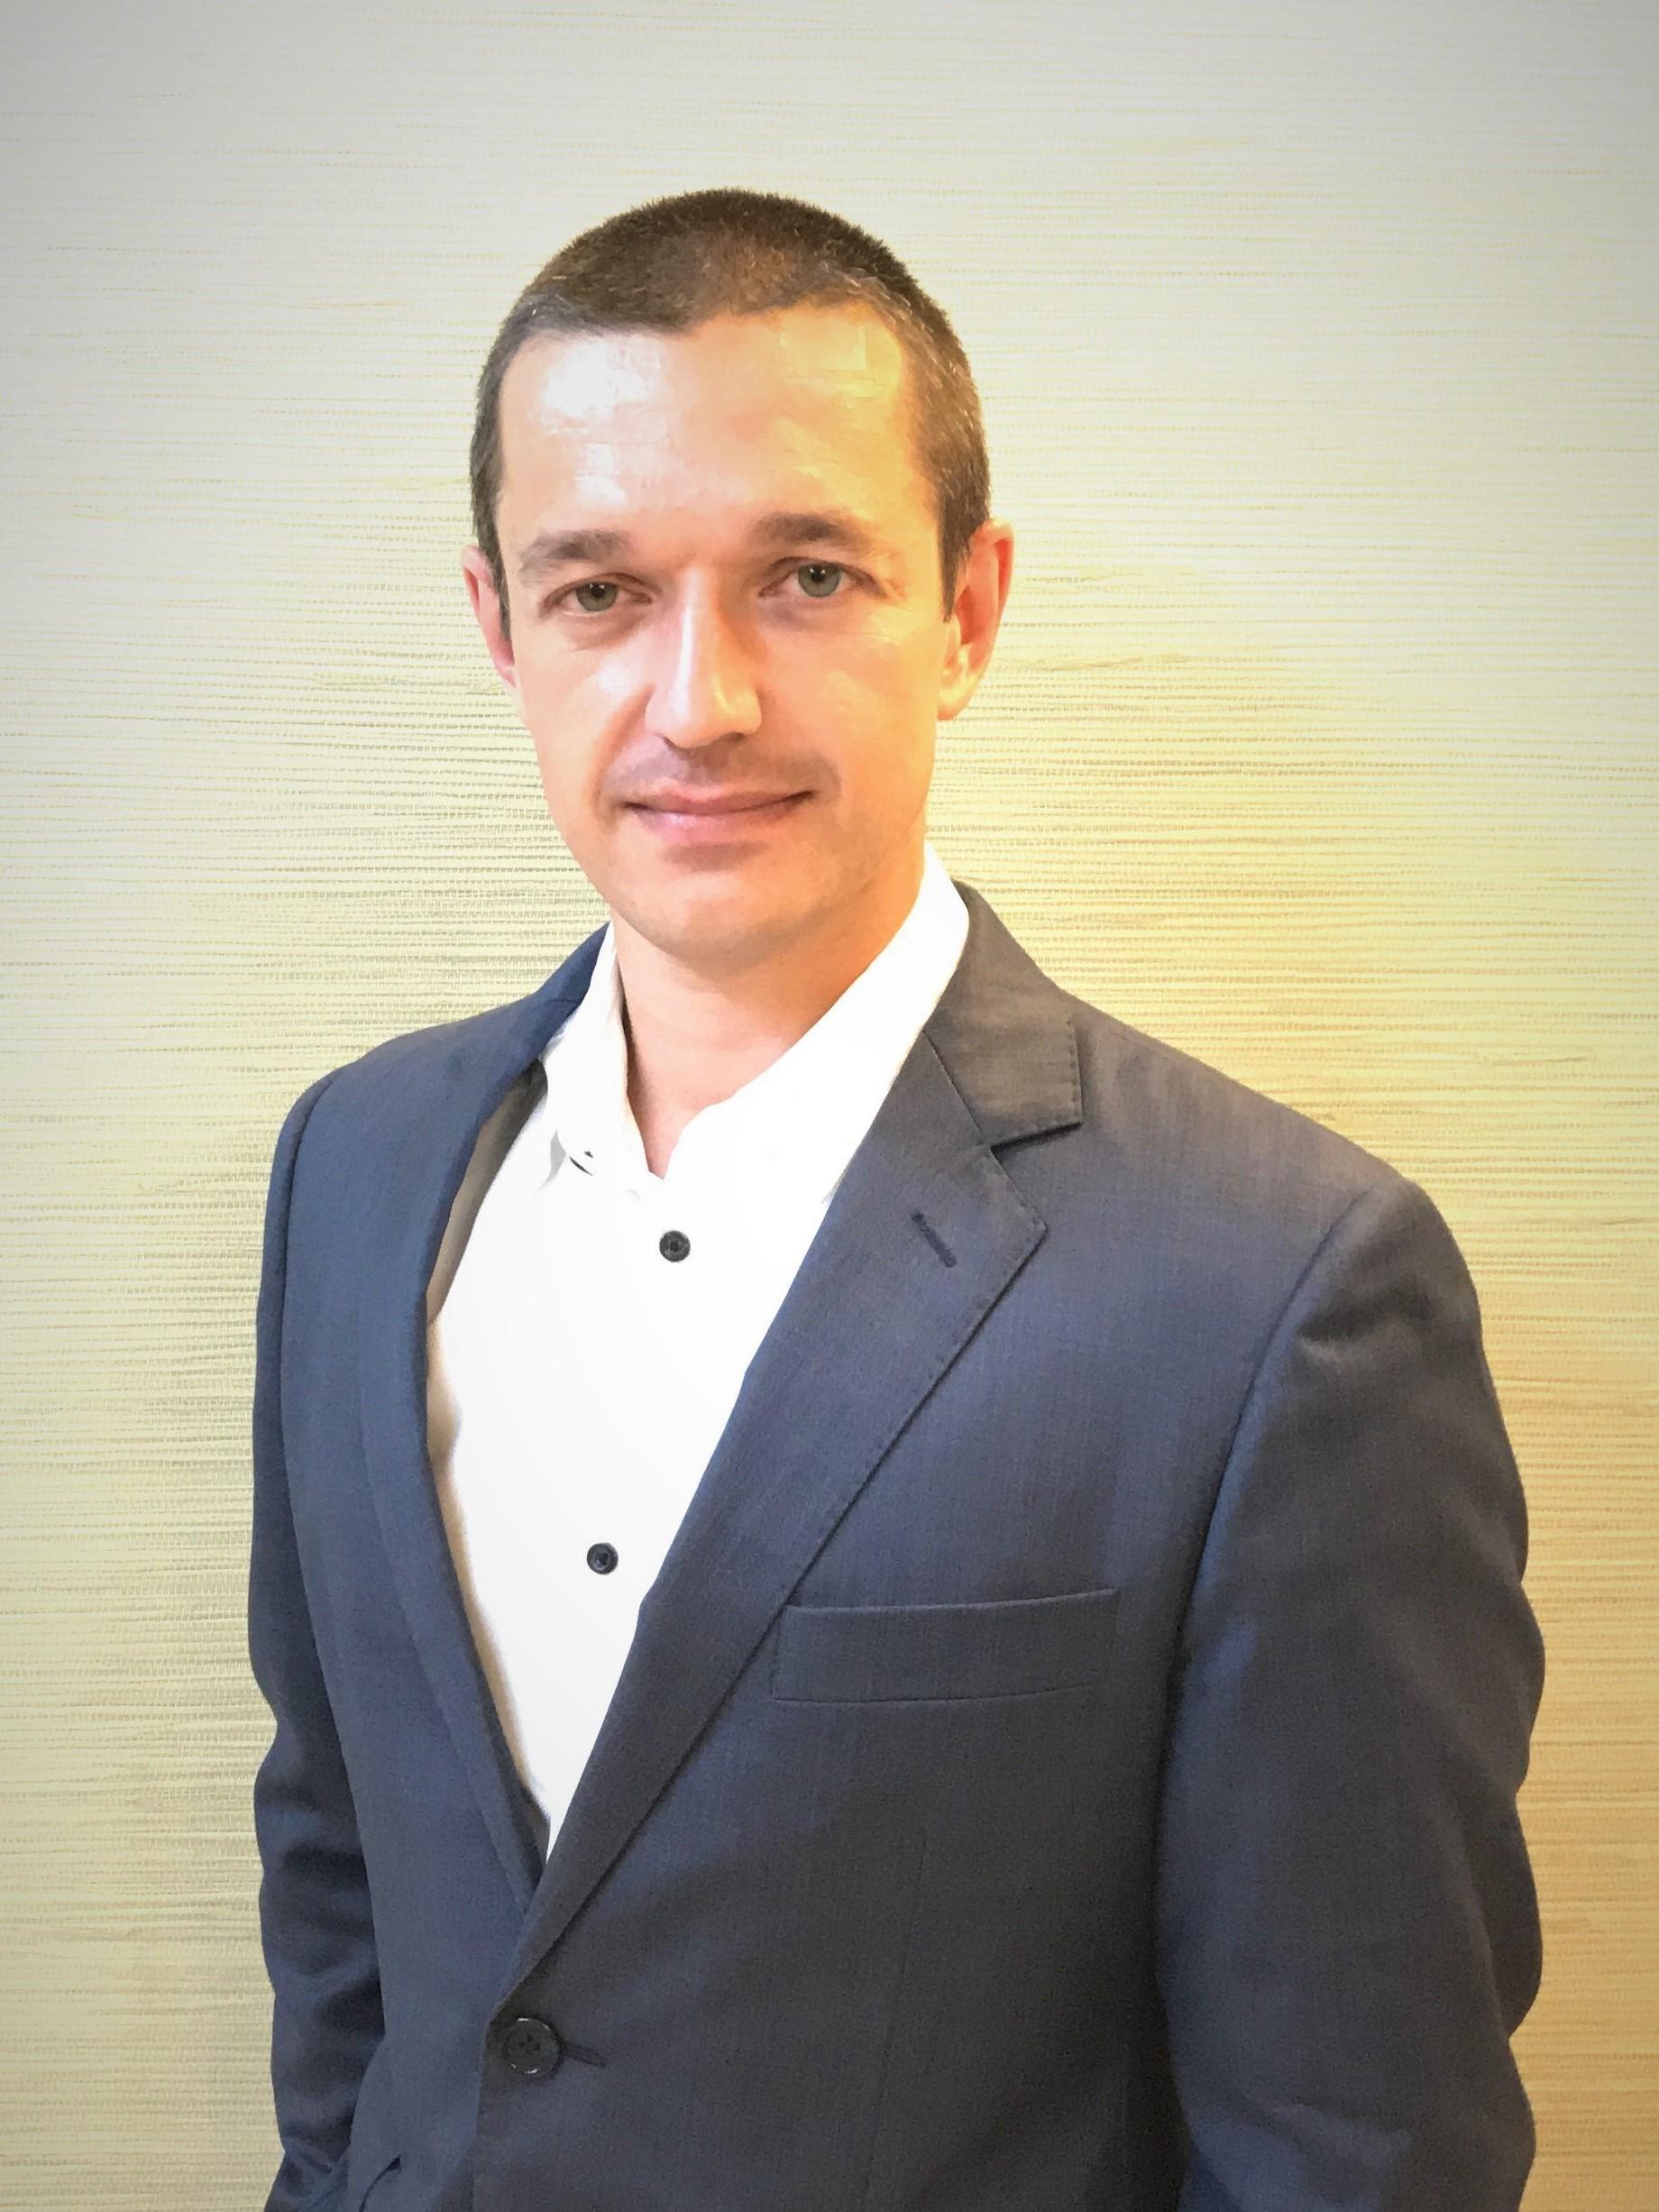 Адвокат Александр Мельчаев